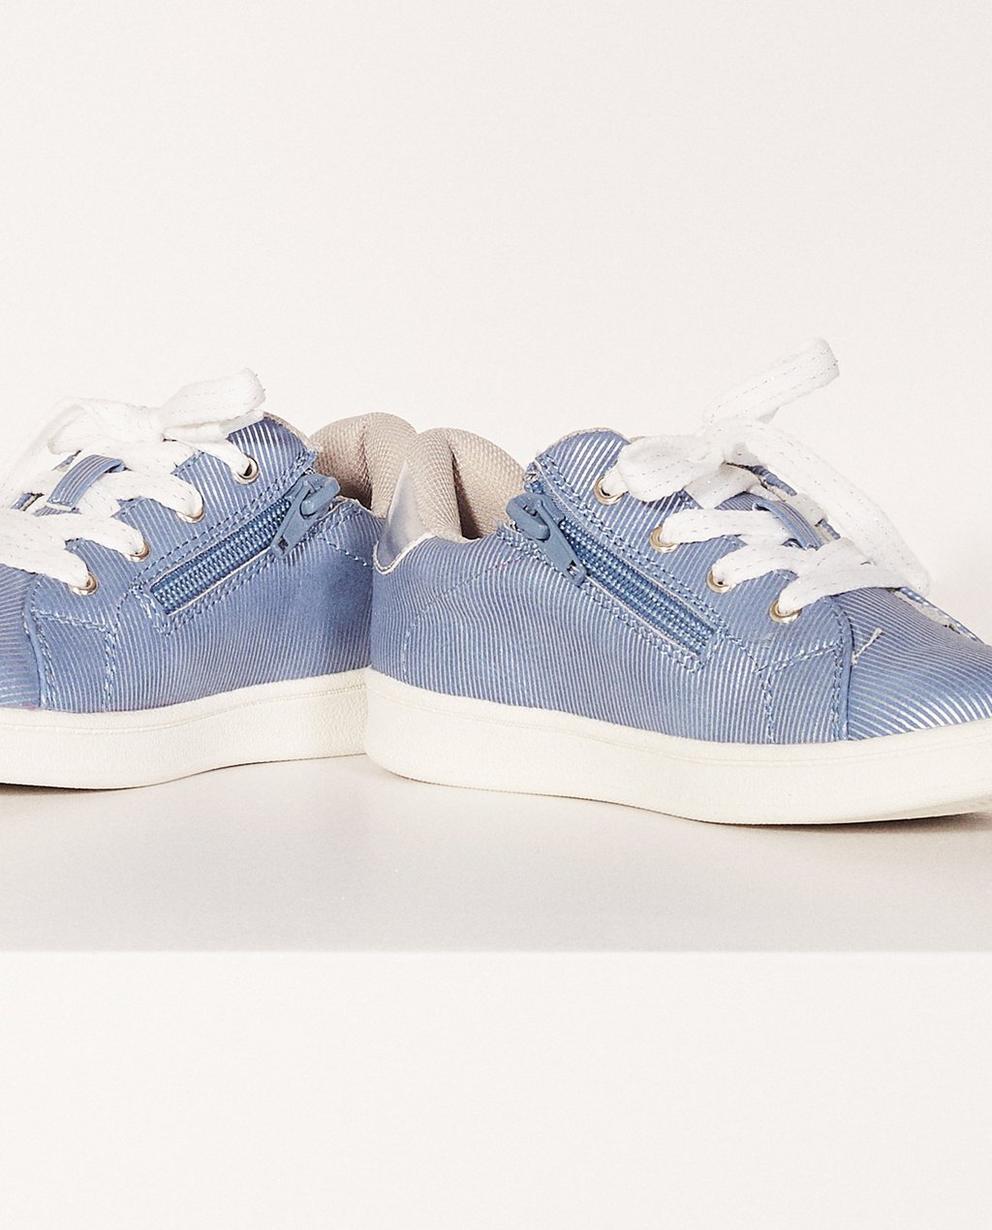 Schuhe - Aqua -